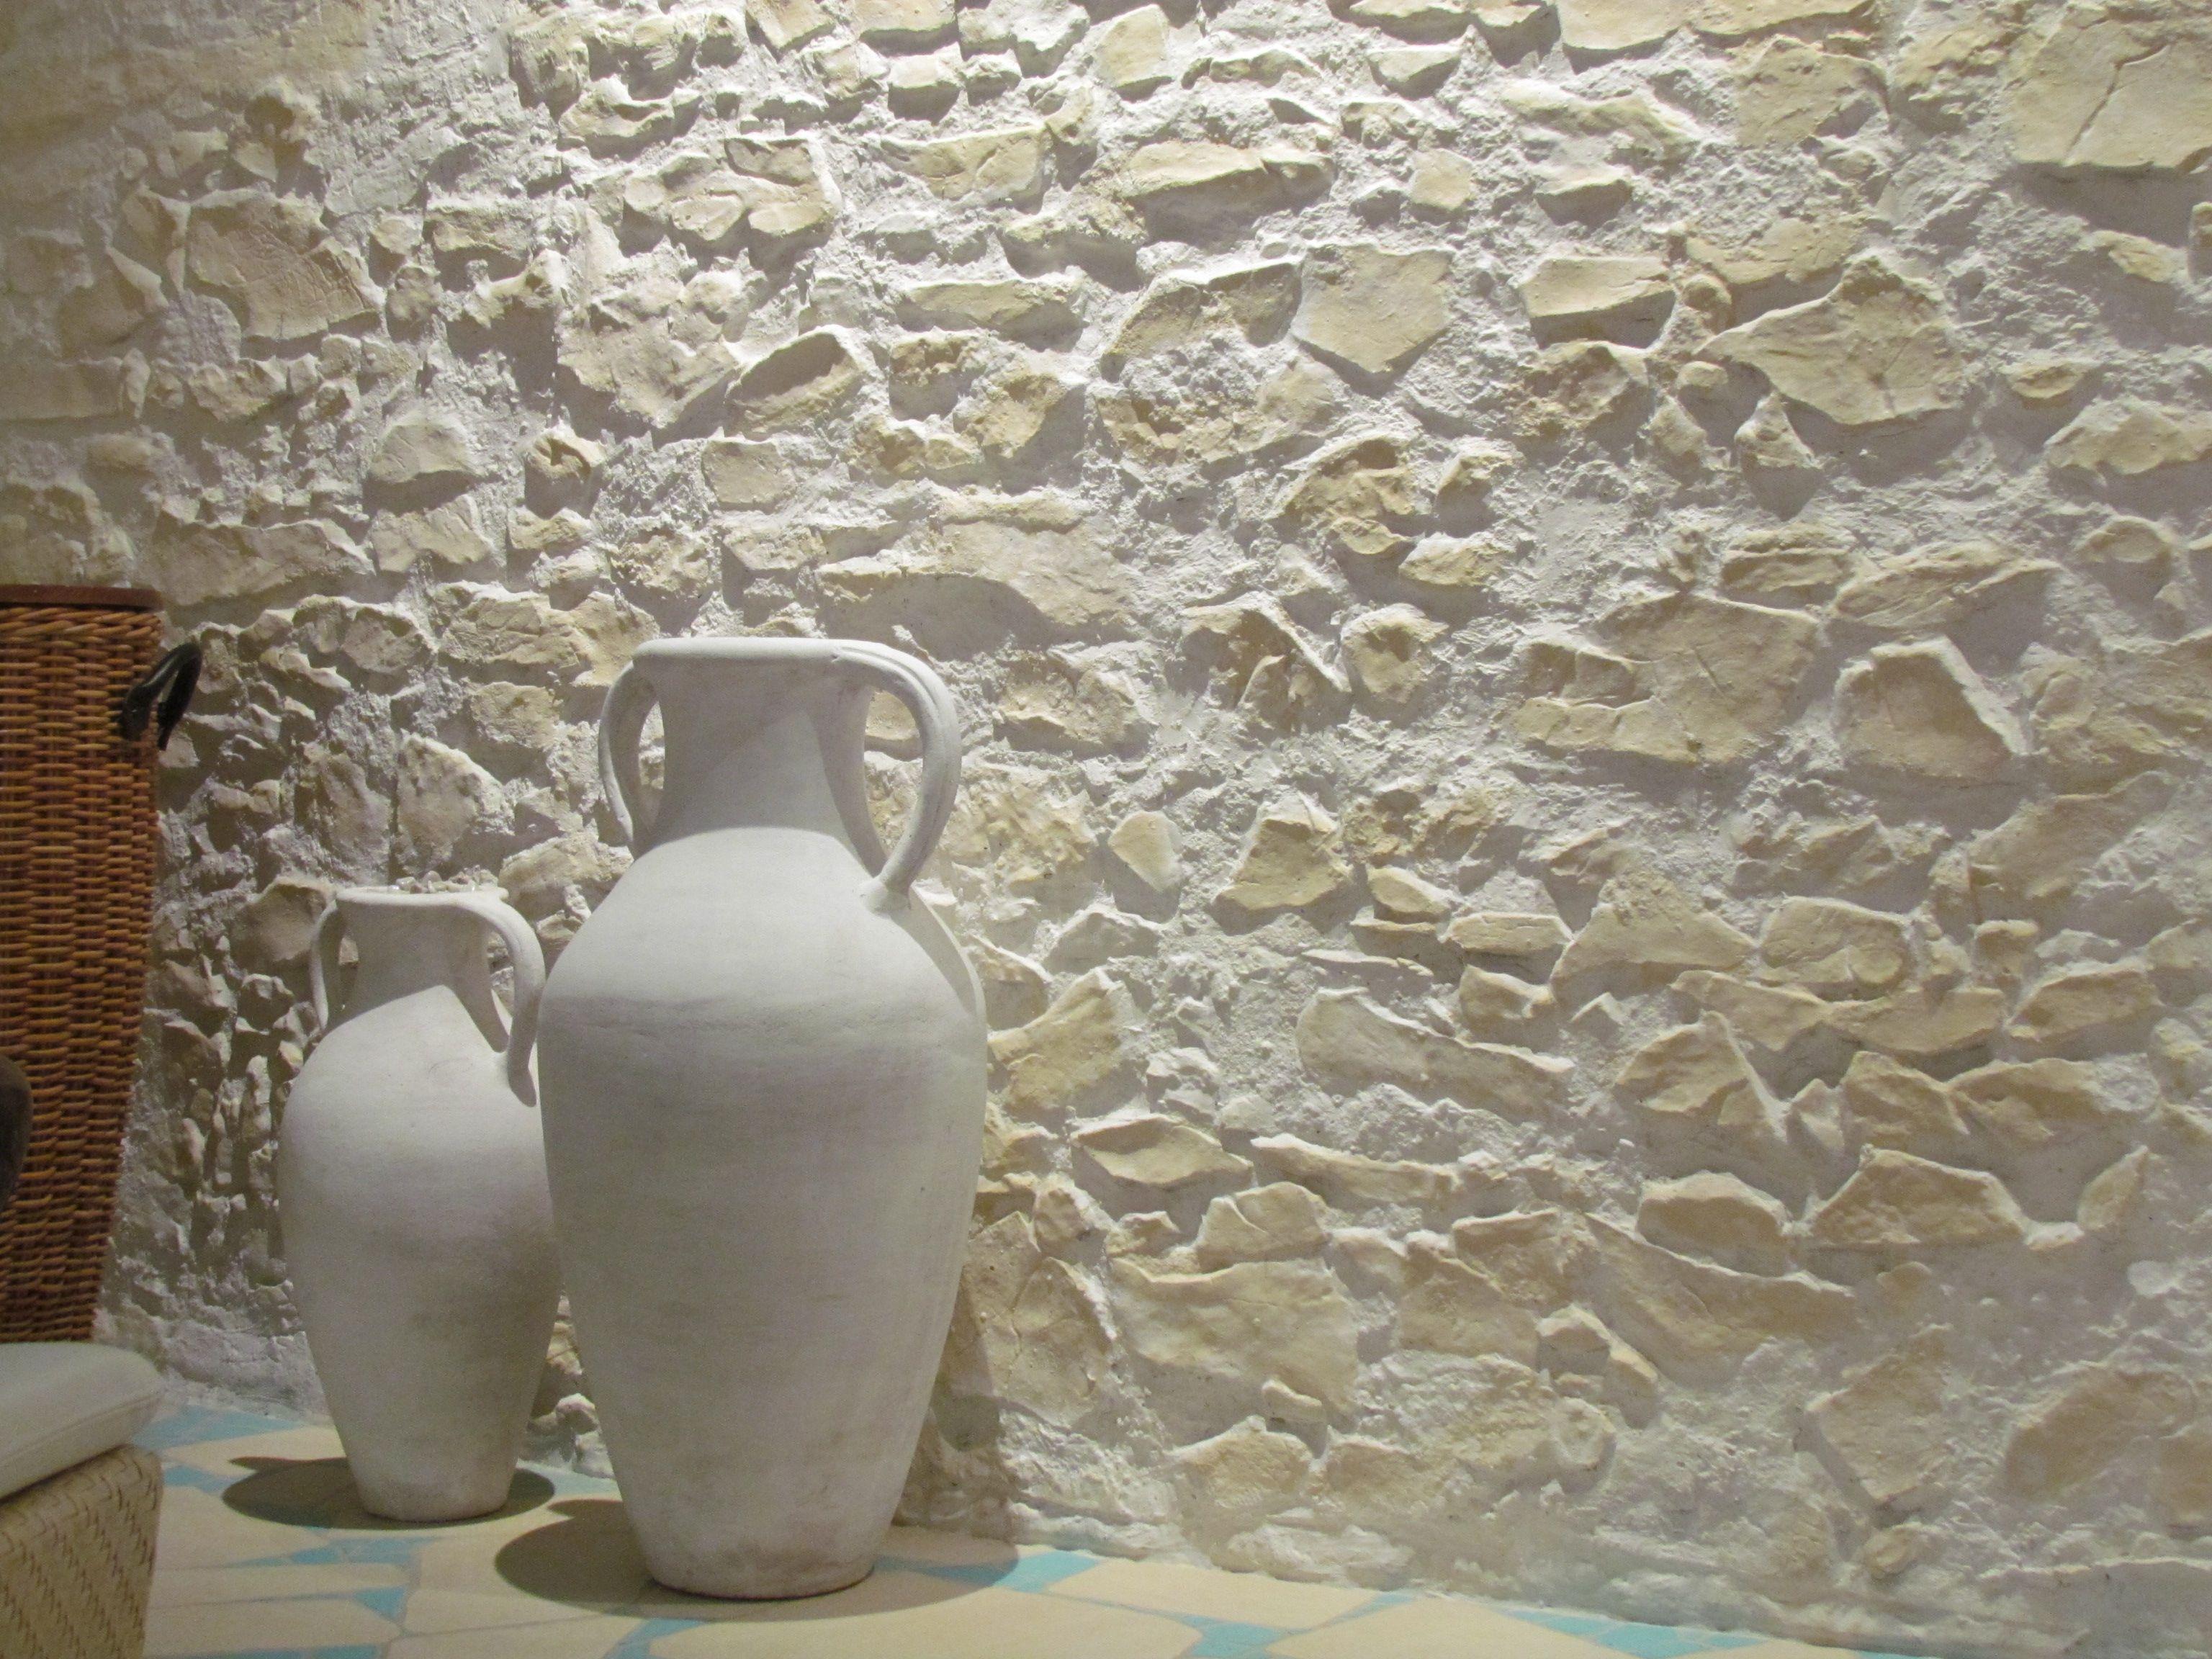 Greek decoration with stone wall marsalla on aida sol wellnessarea s in stonedesign - Steinwand styropor ...